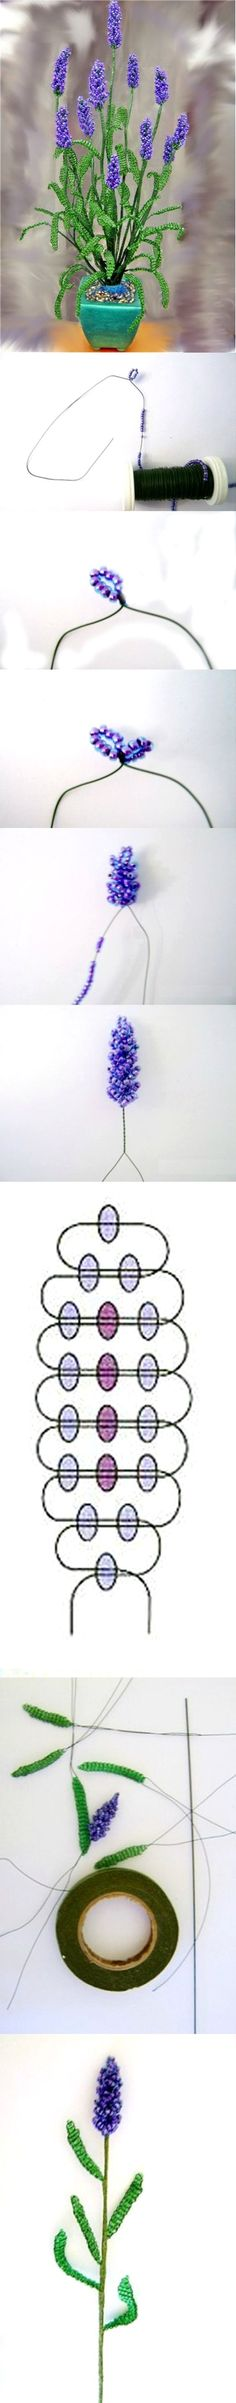 bead lavender tutorial: